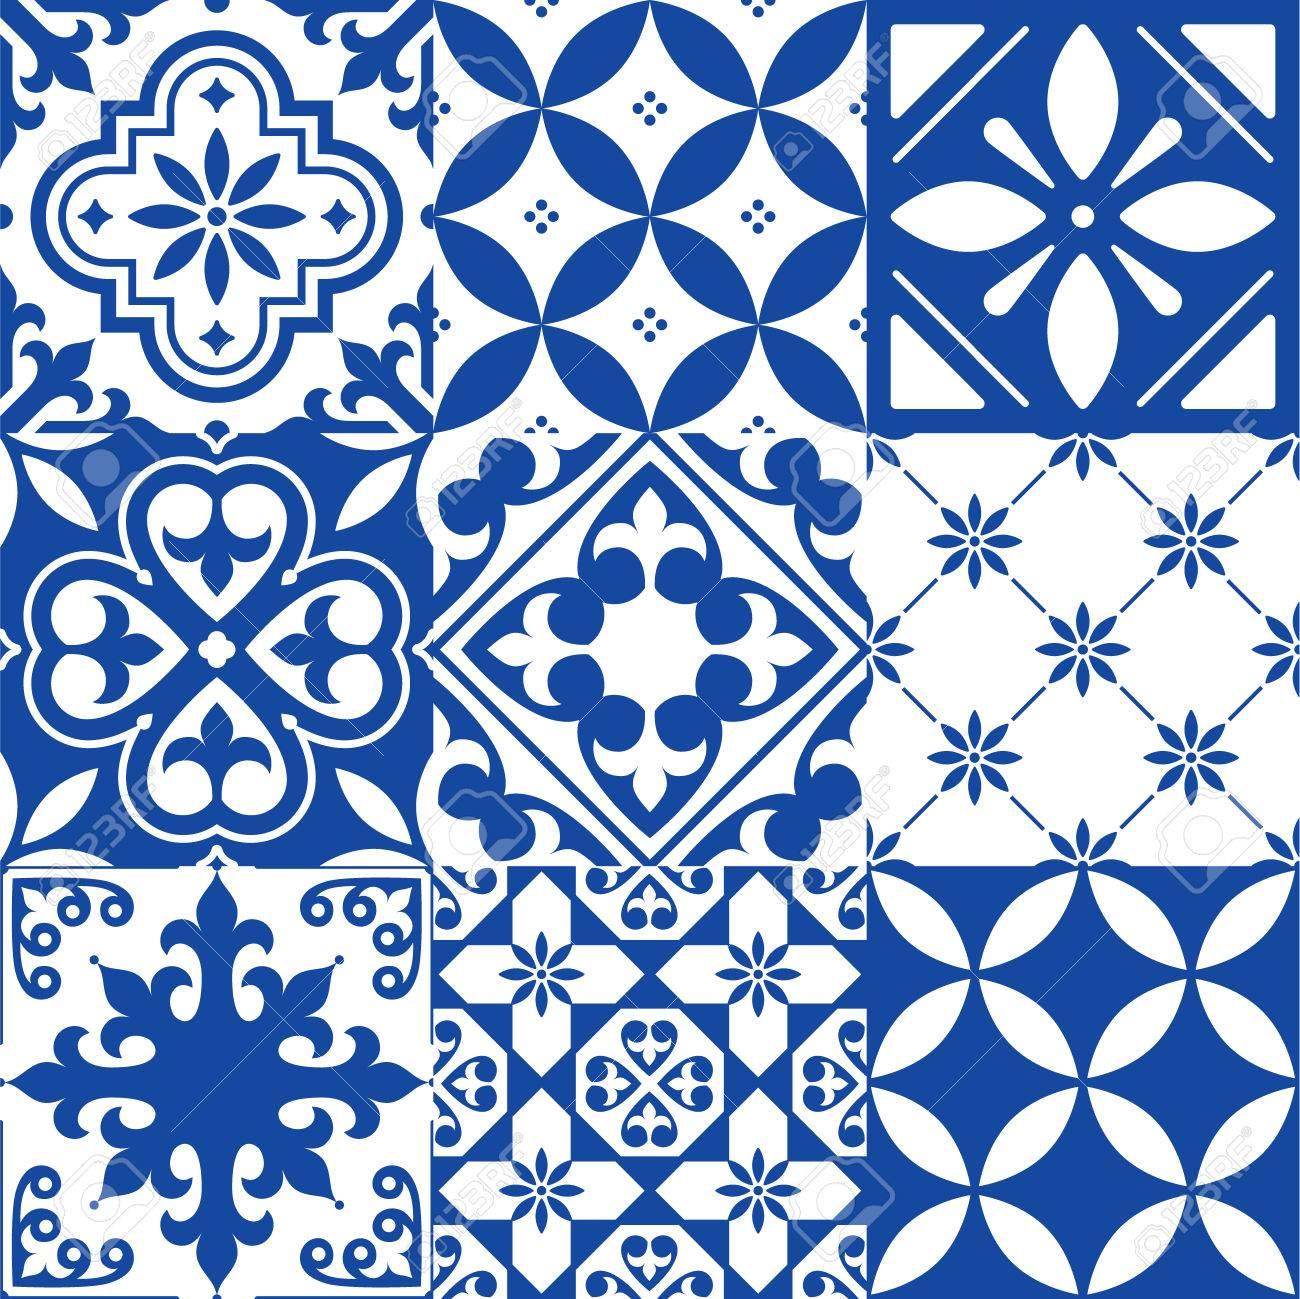 Carrelage Espagnol Design Carrelage Marocain Modèle Bleu Marine - Carrelage bleu